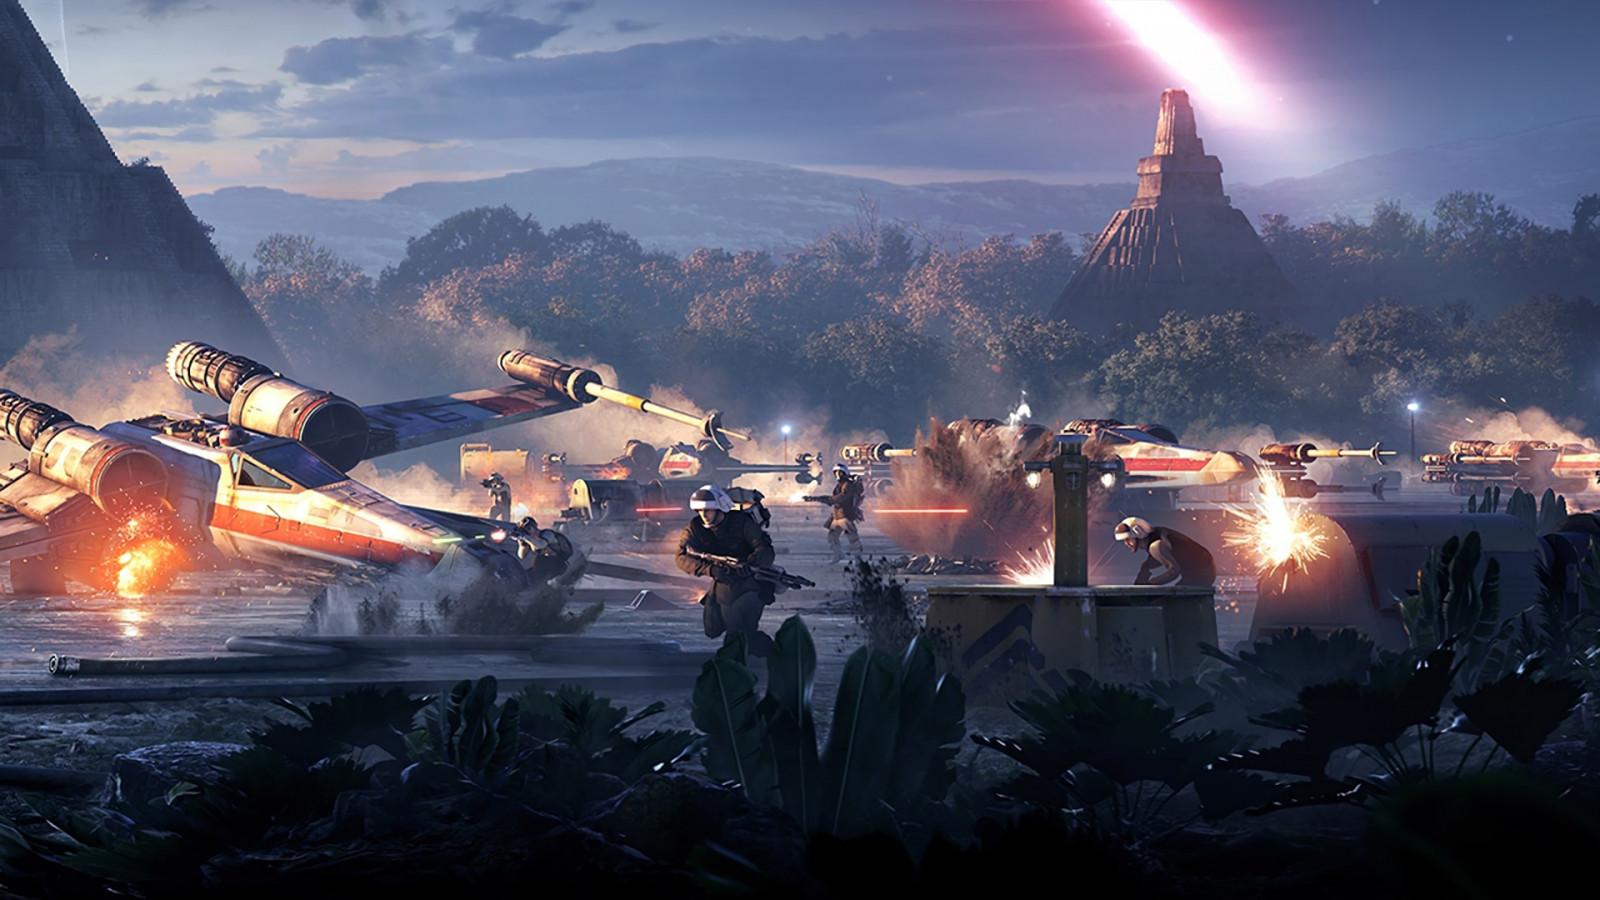 Wallpaper Star Wars Battlefront Ii Star Wars Video Games X Wing